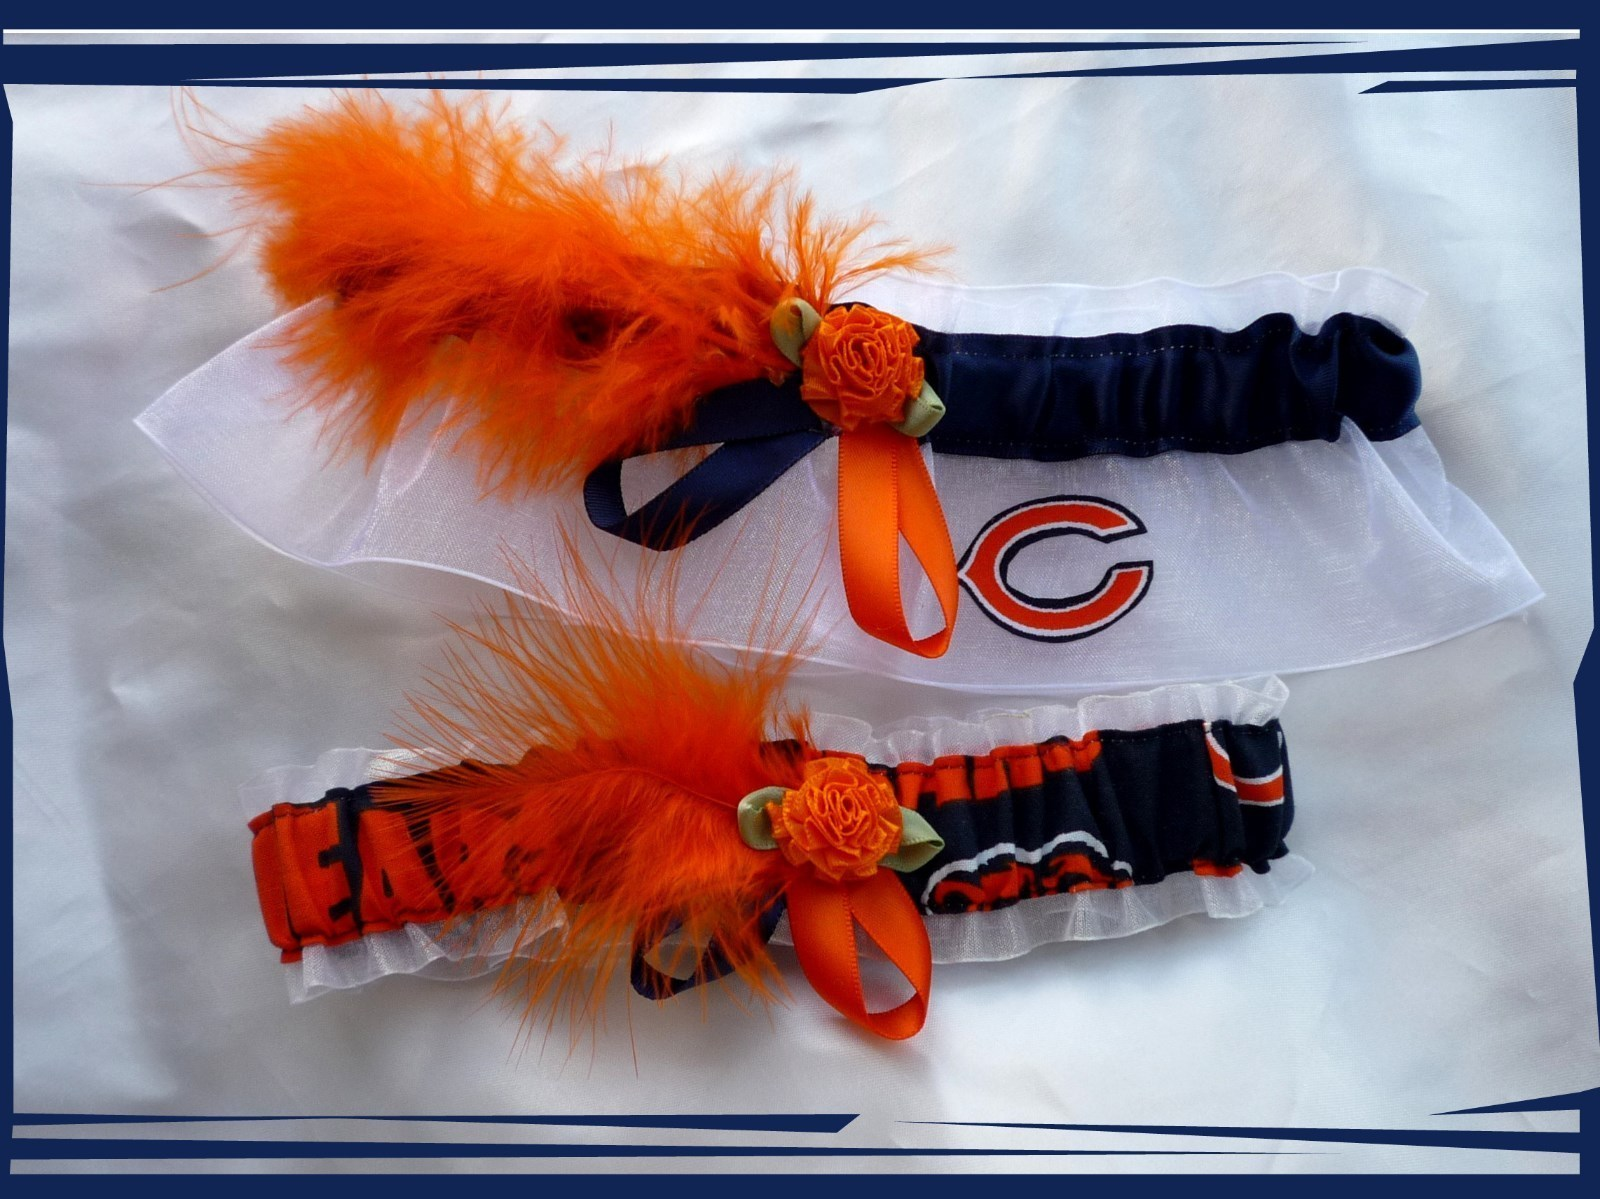 24.99$  Buy now - http://vizsm.justgood.pw/vig/item.php?t=f3yq7o7941 - Chicago Bears White Organza Fabric Feathers Wedding Garter Set